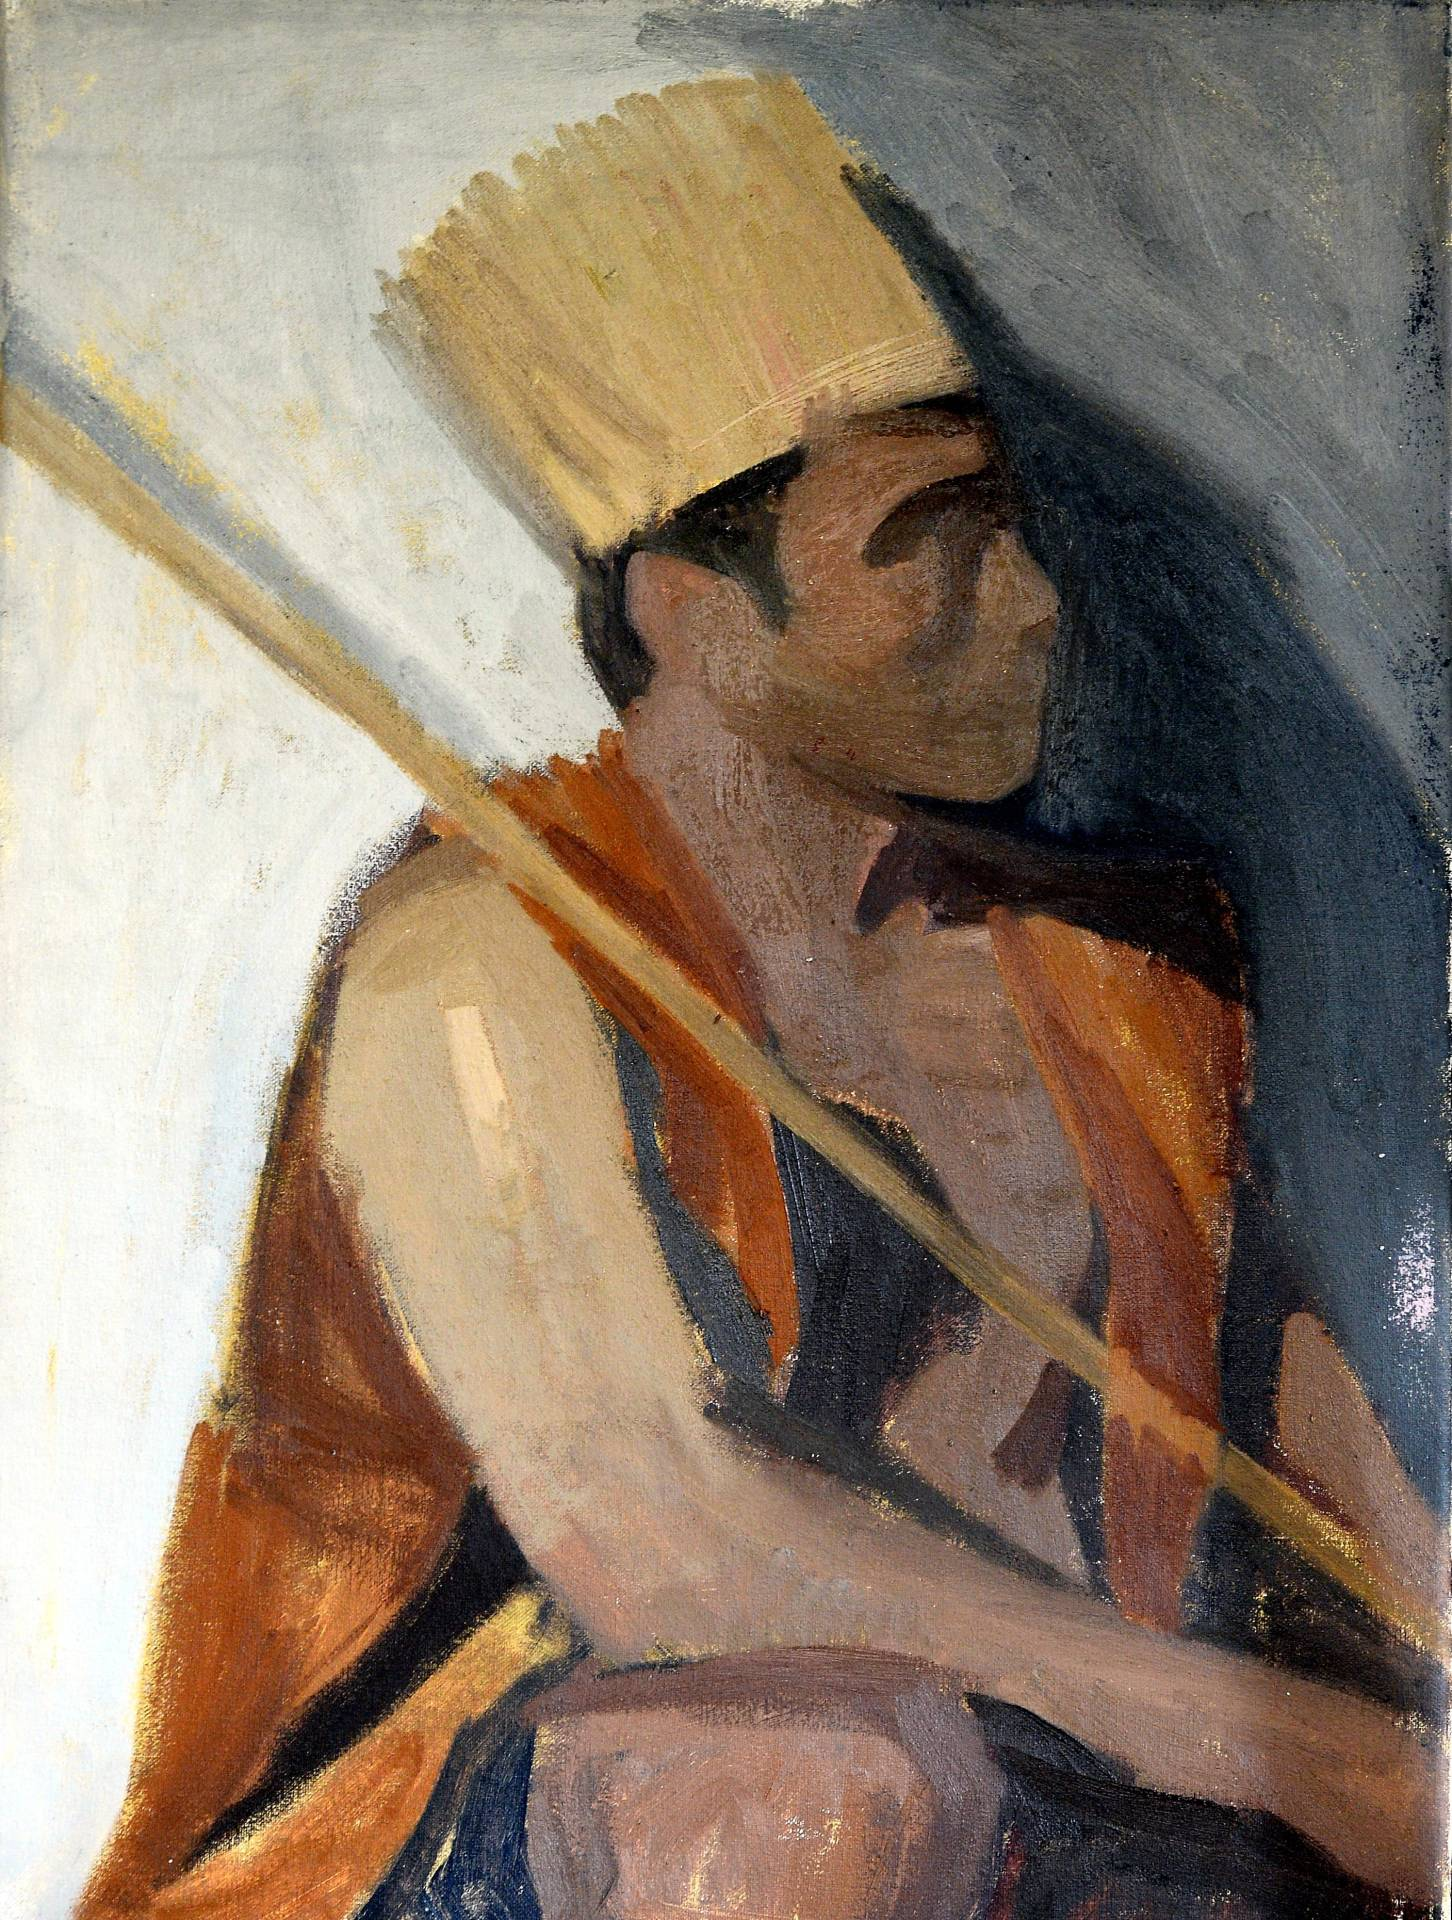 Ritom's 'Temiar Lawan' (oil on canvas), his portrait of Temuan artist Shaq Koyok.